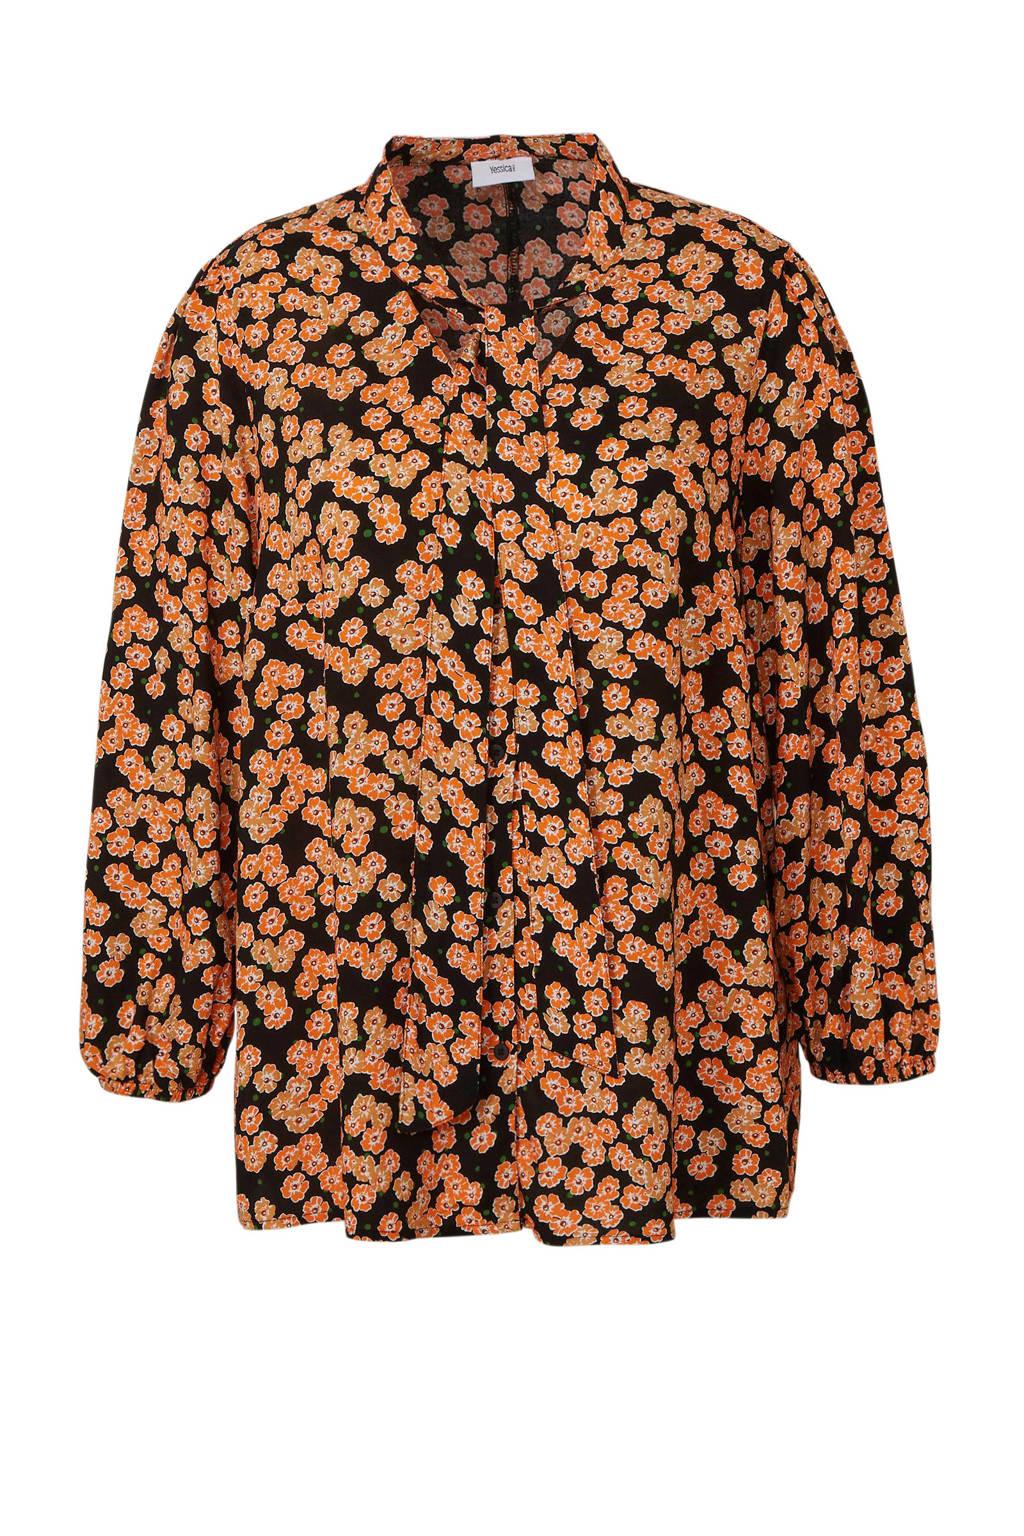 C&A XL Yessica gebloemde blouse oranje/zwart, Oranje/zwart